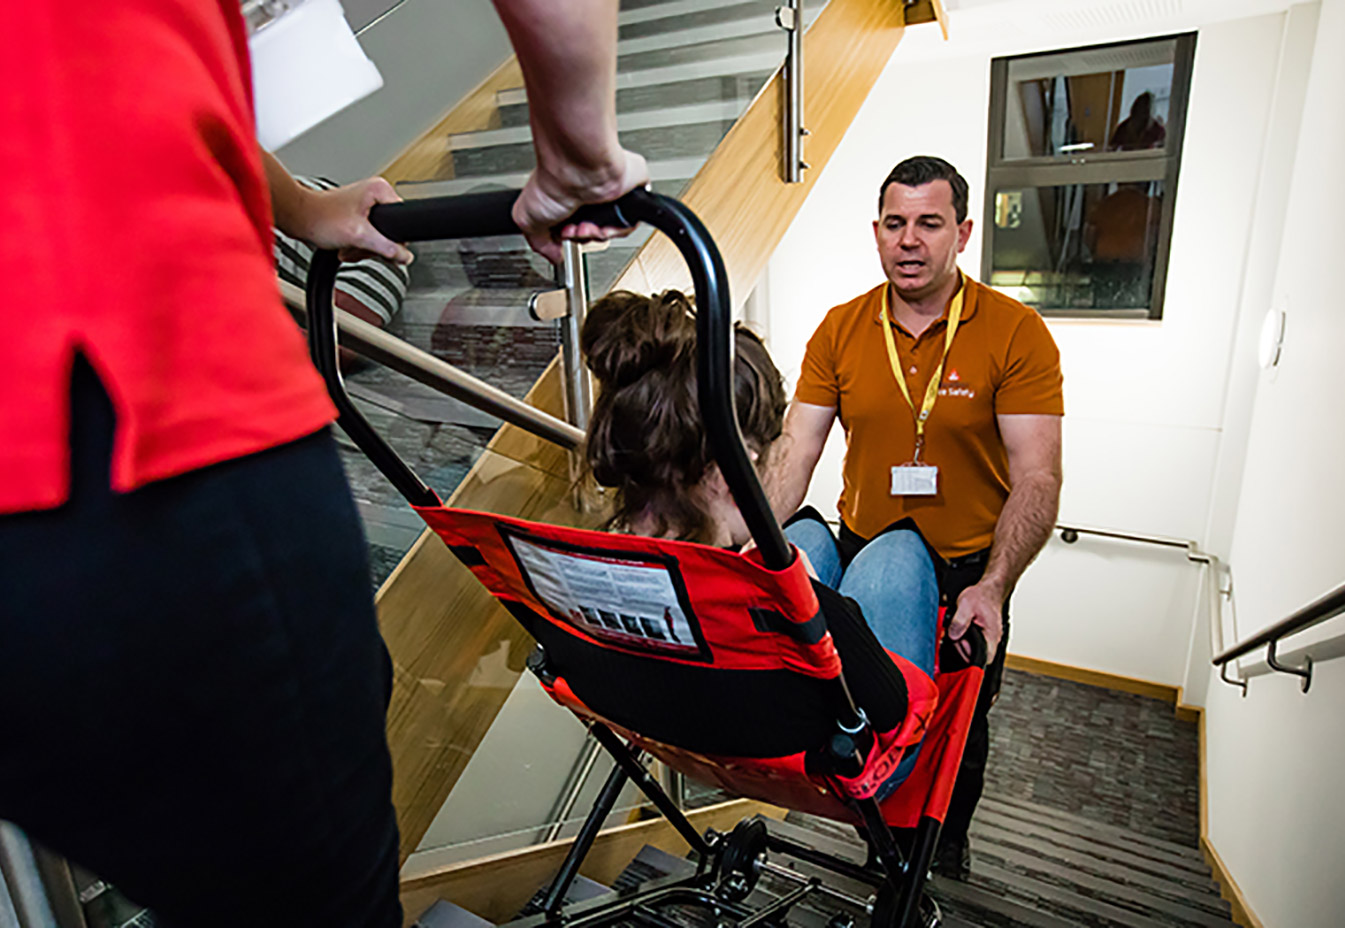 Evacuation chair training - a beginners guide